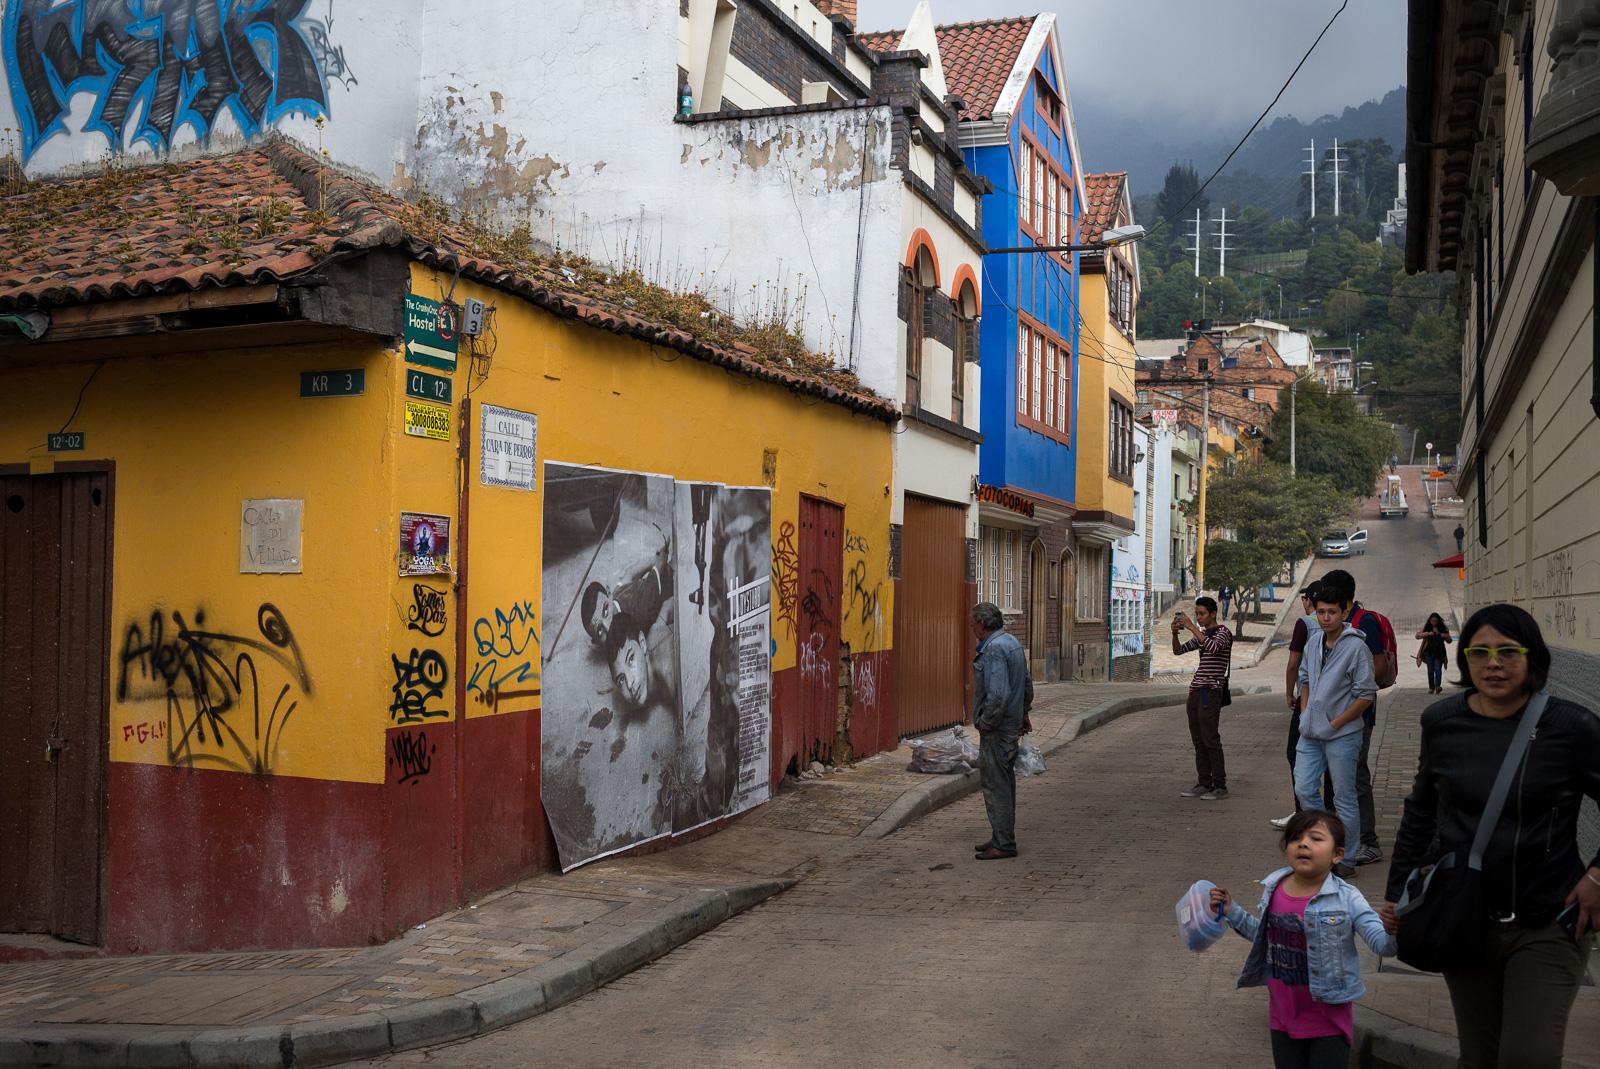 20161029-colombia-1001449.jpg